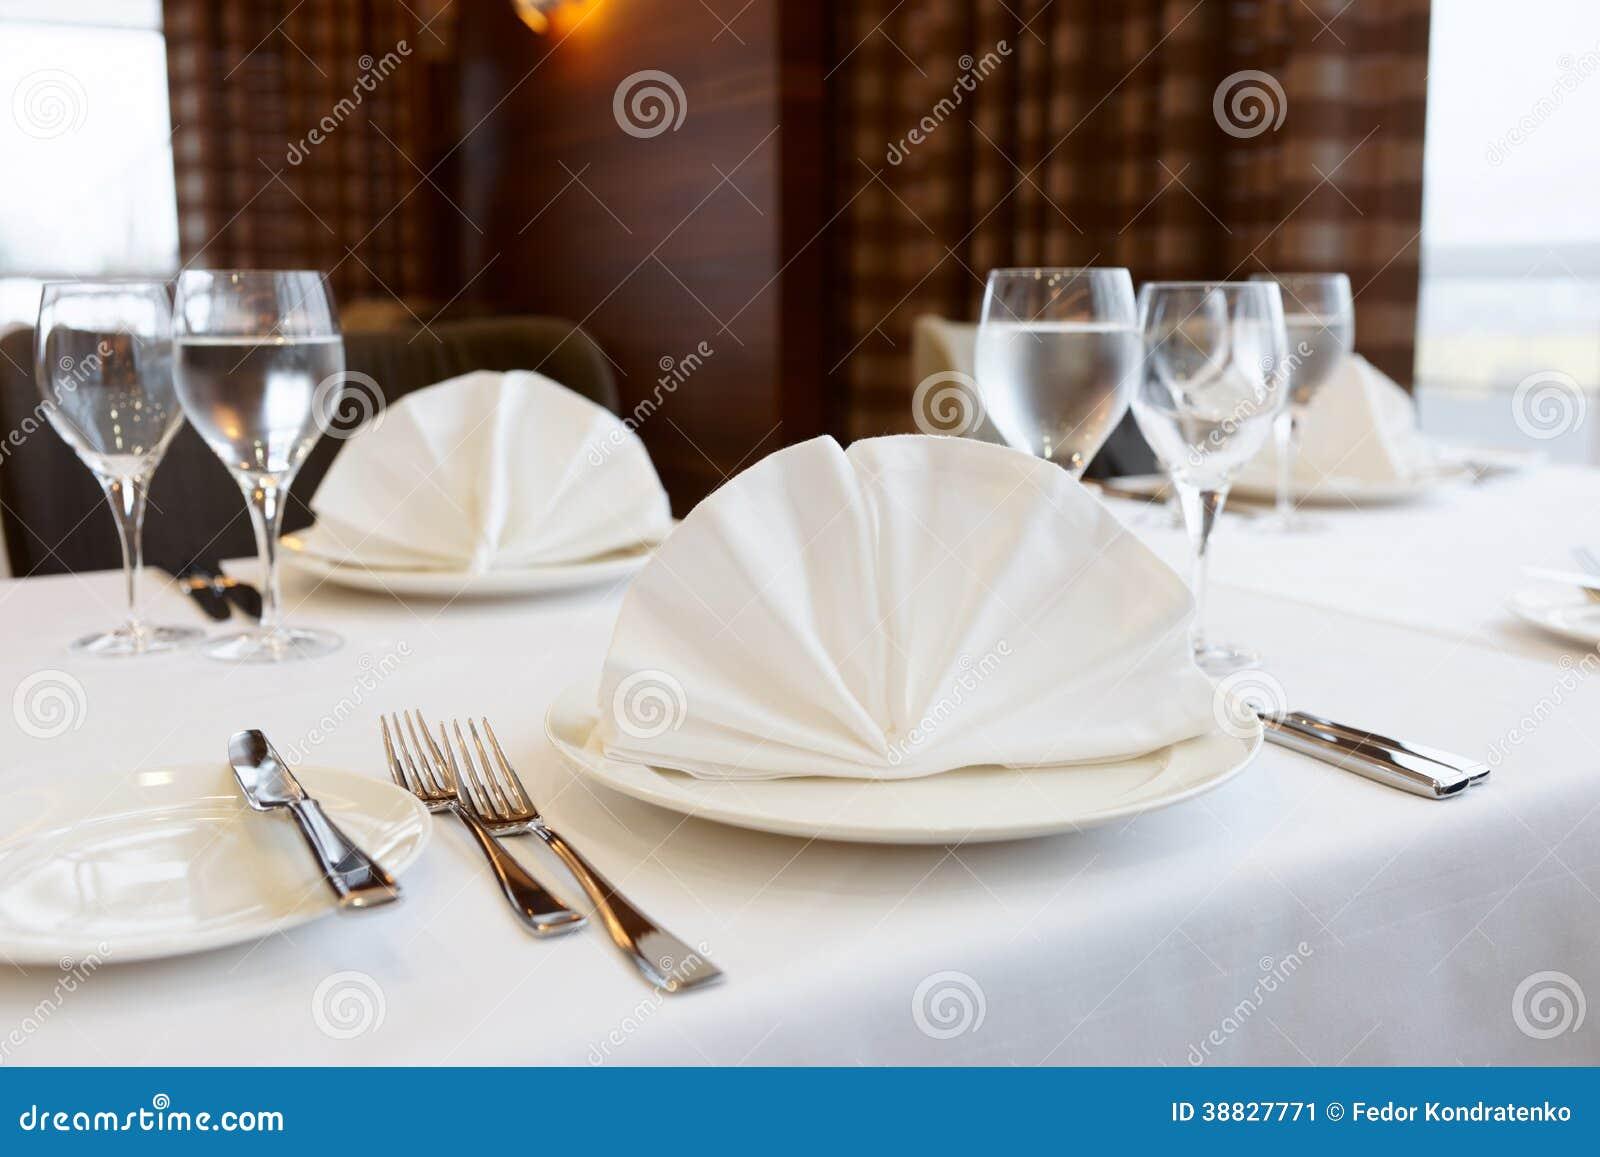 table arrangement in an expensive restaurant stock photo. Black Bedroom Furniture Sets. Home Design Ideas